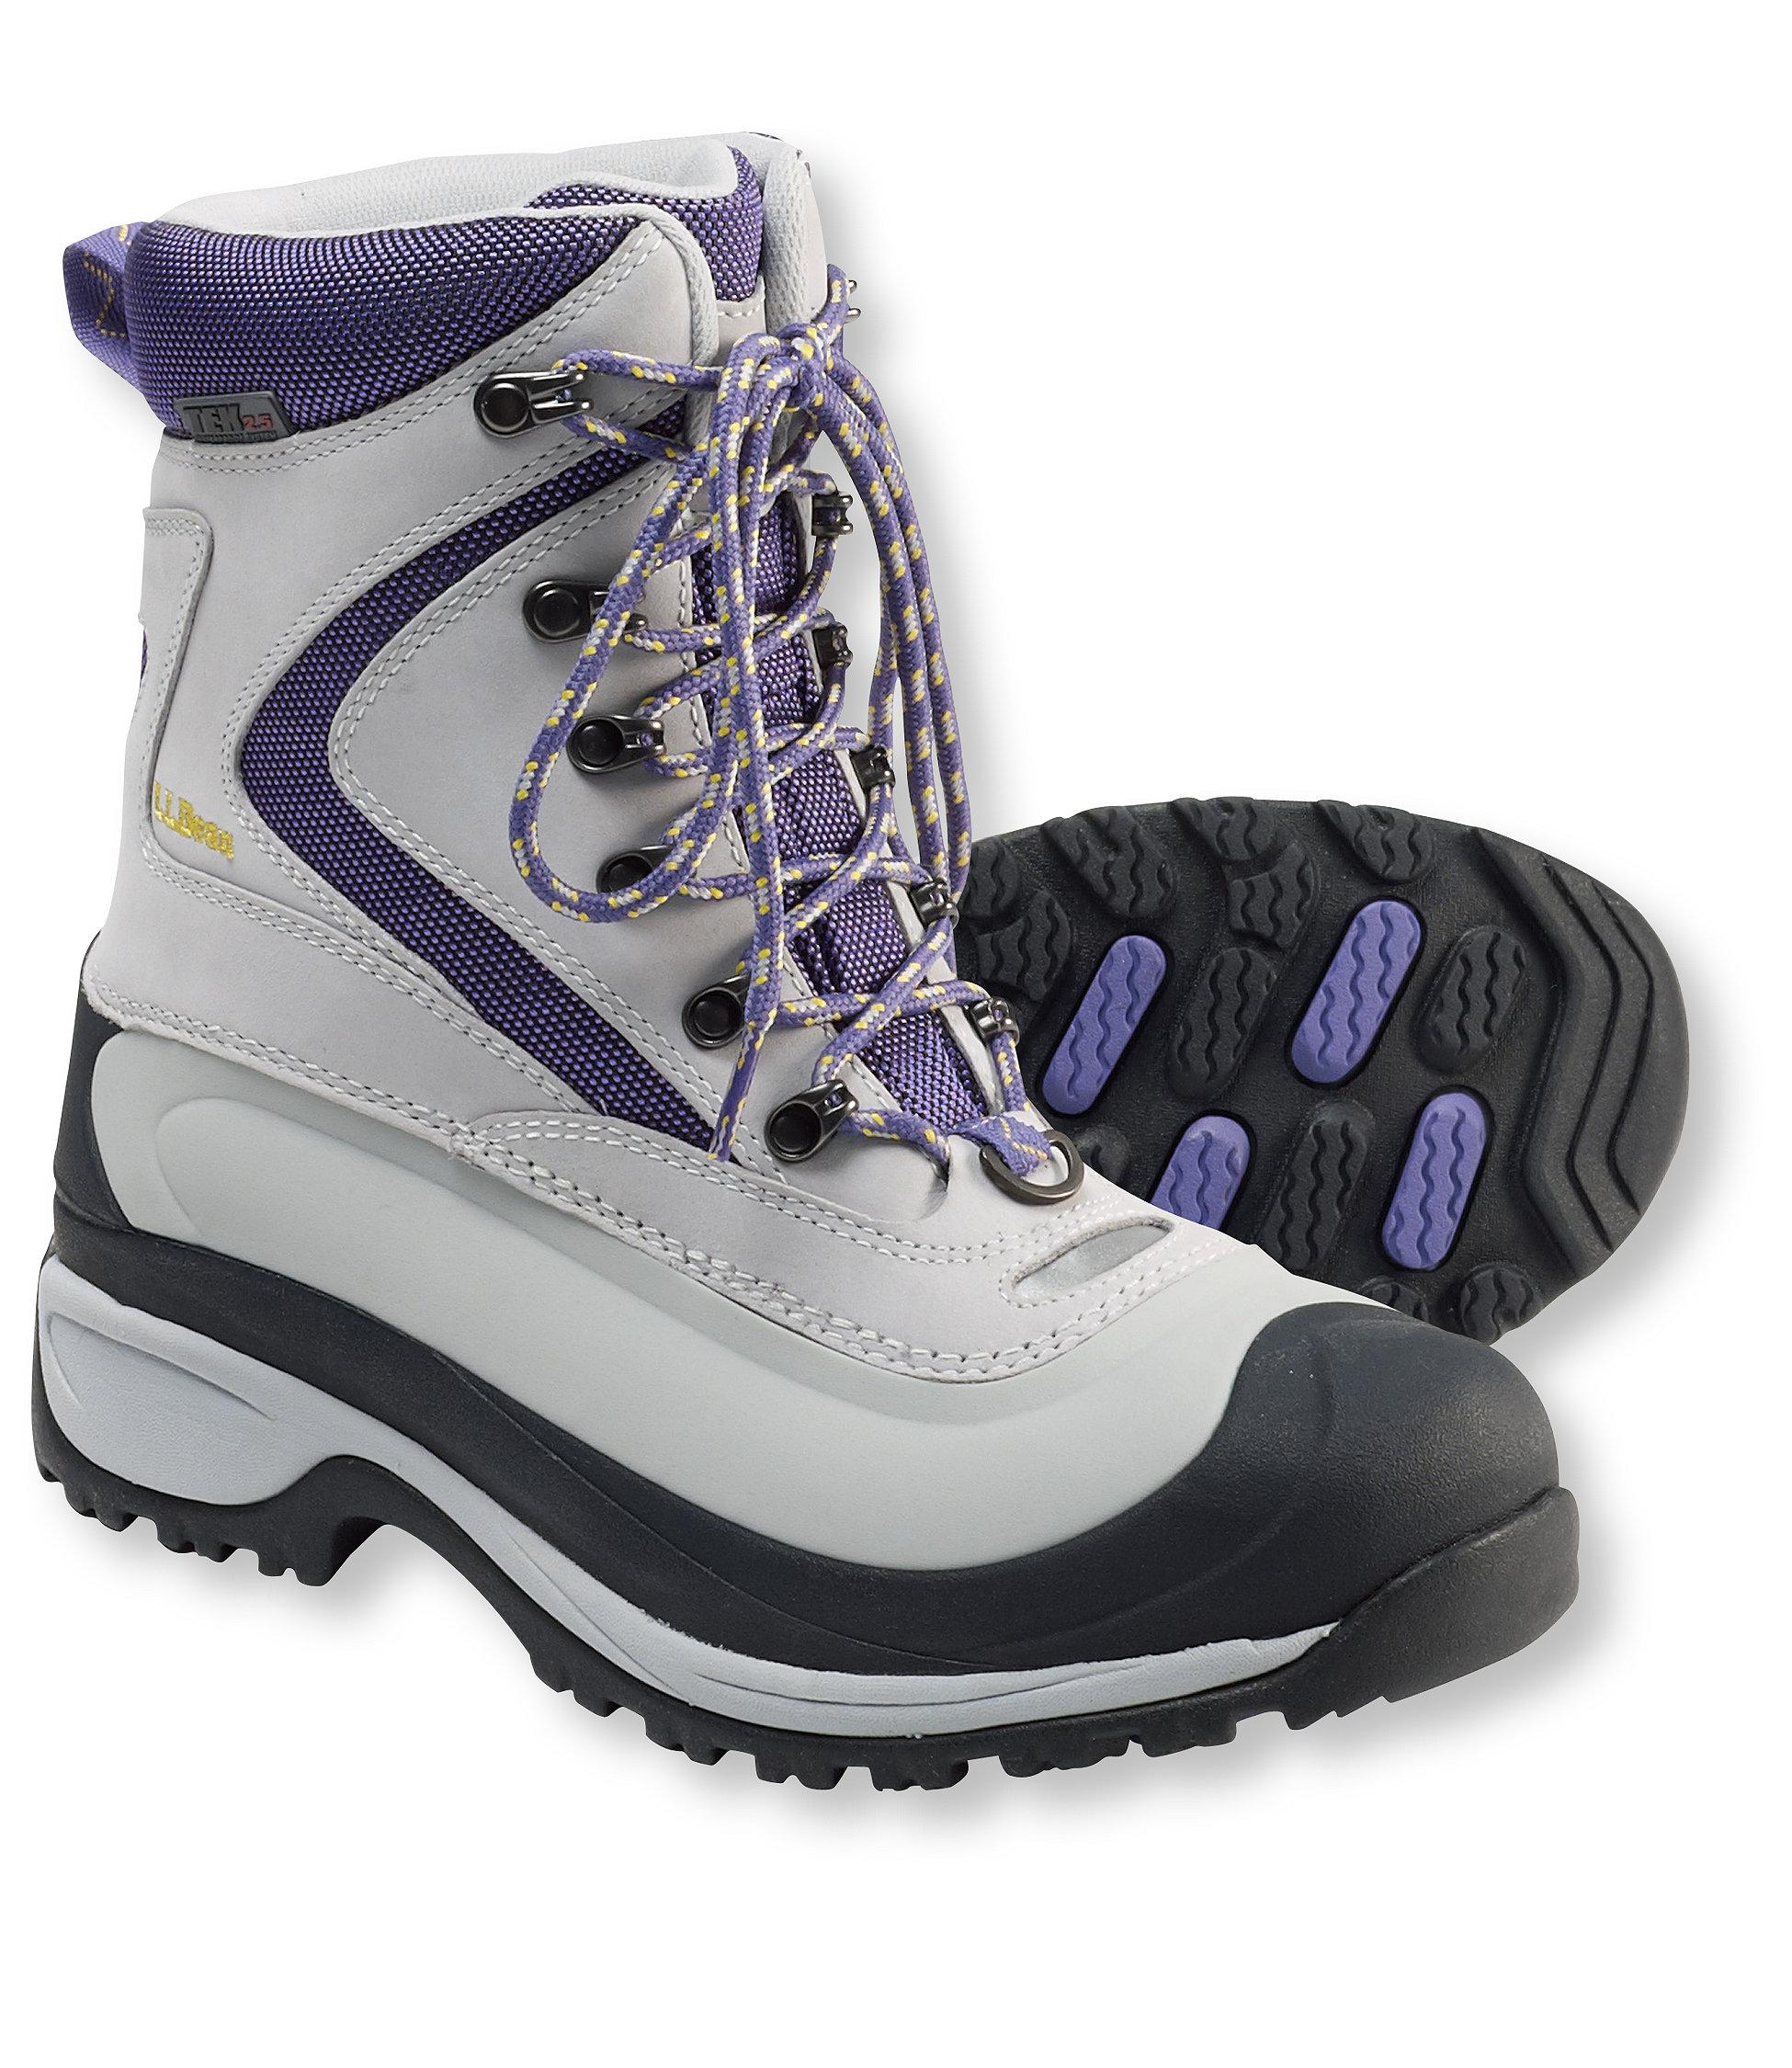 L.L.Bean Wildcat II Boots, Lace-Up